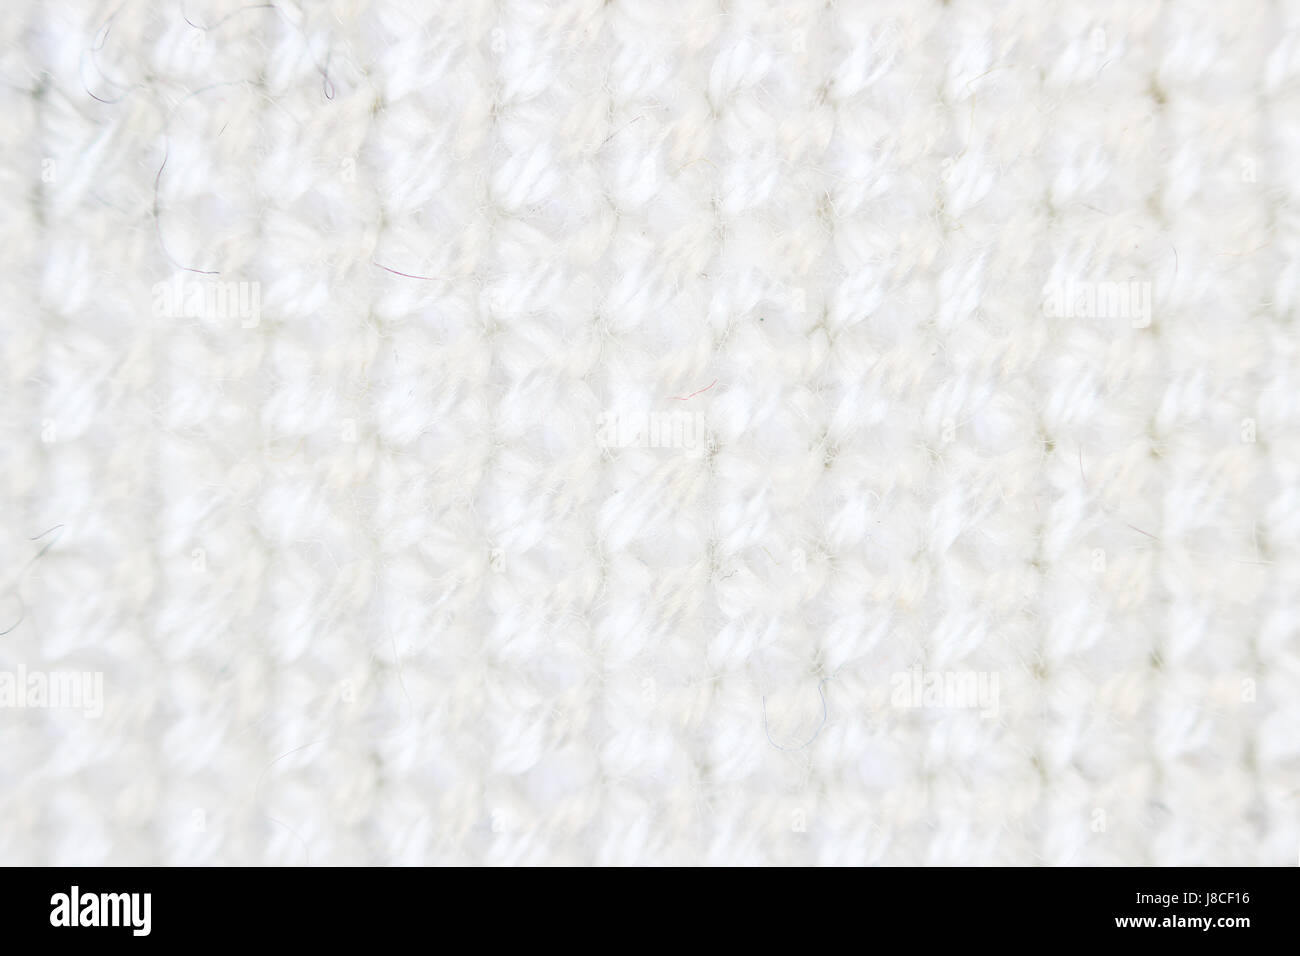 Embroidery Pattern Imágenes De Stock & Embroidery Pattern Fotos De ...